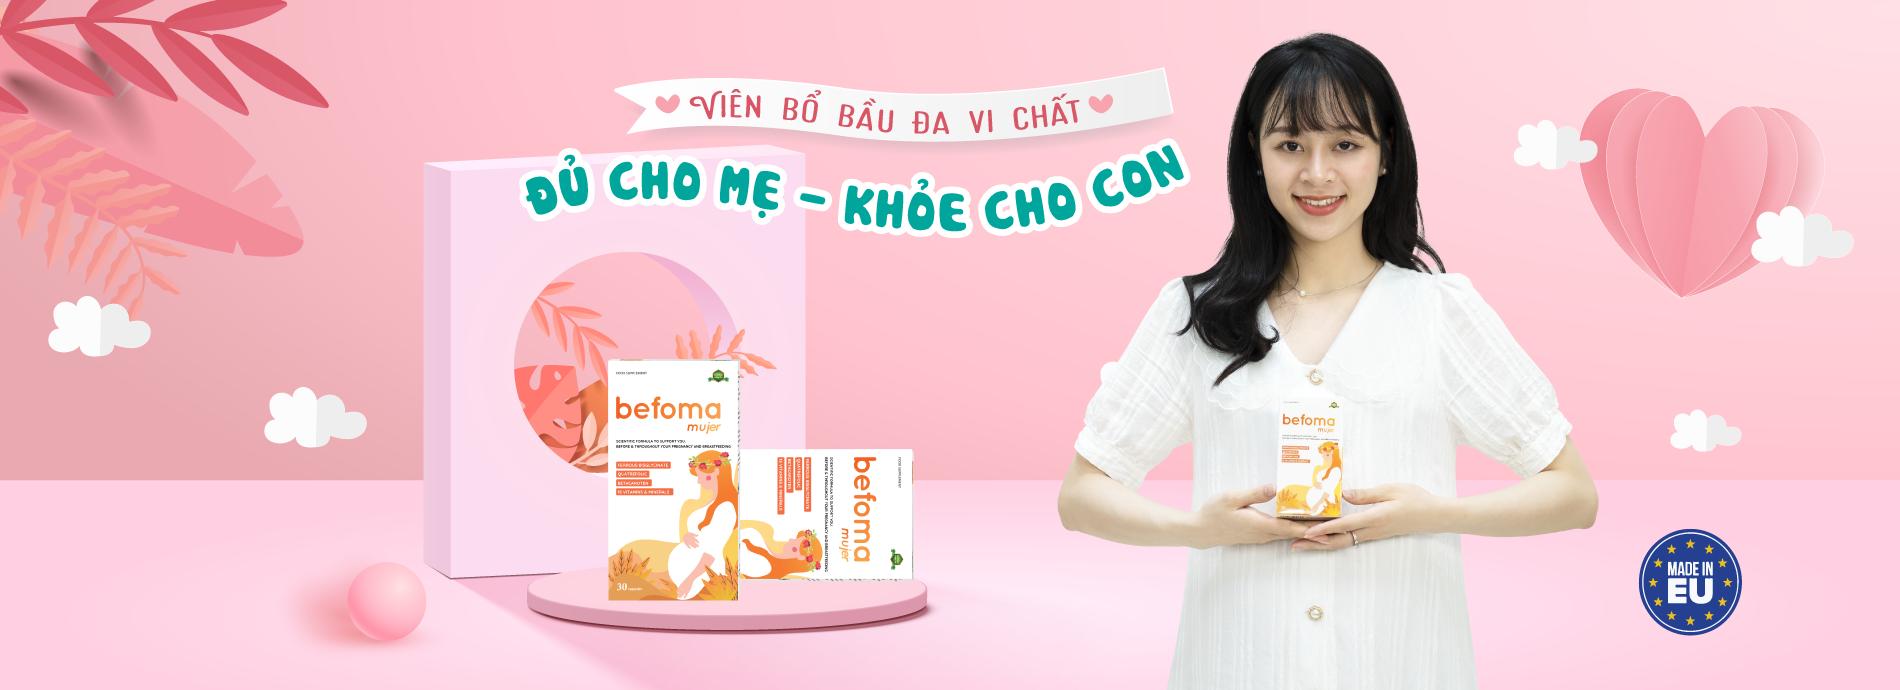 befoma-du-cho-me-khoe-cho-con